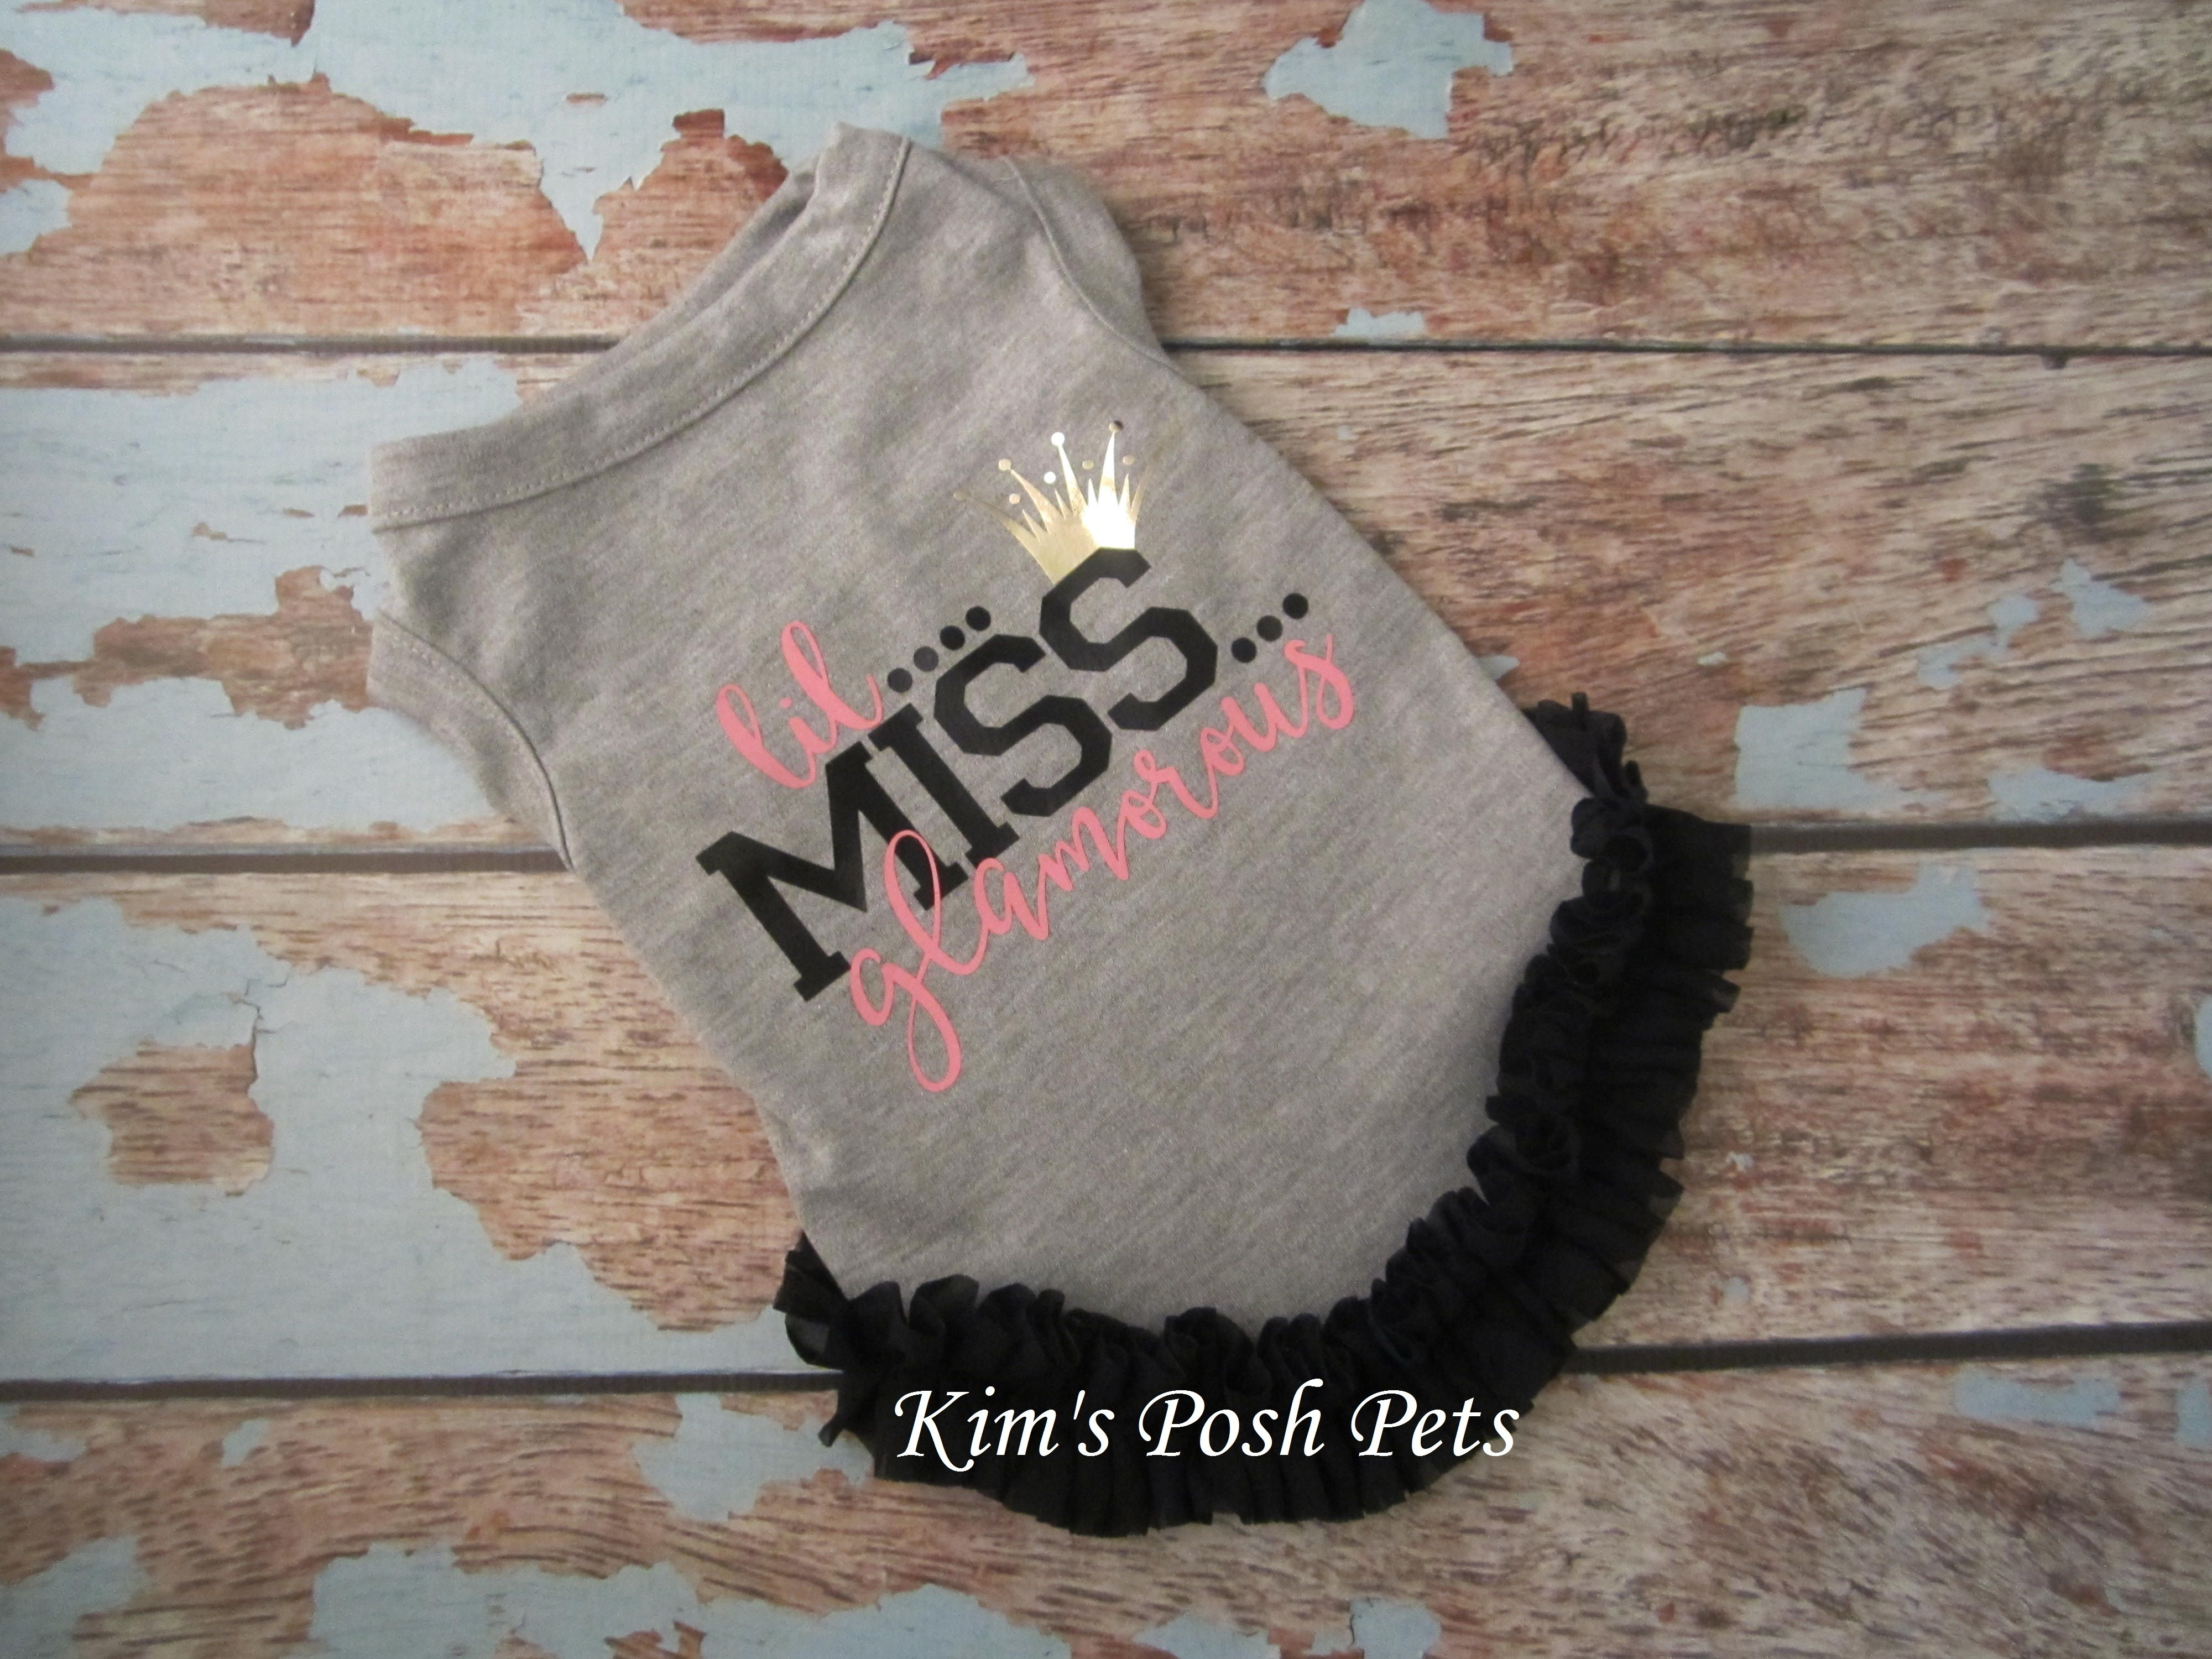 Lil Miss Glamorous Dog Dress Dog T Shirt 2018 Fall Kimsposhpets Please Follow Me On Facebook Etsy Instagram Pinterest Kim S Dog Dresses Pets Kim